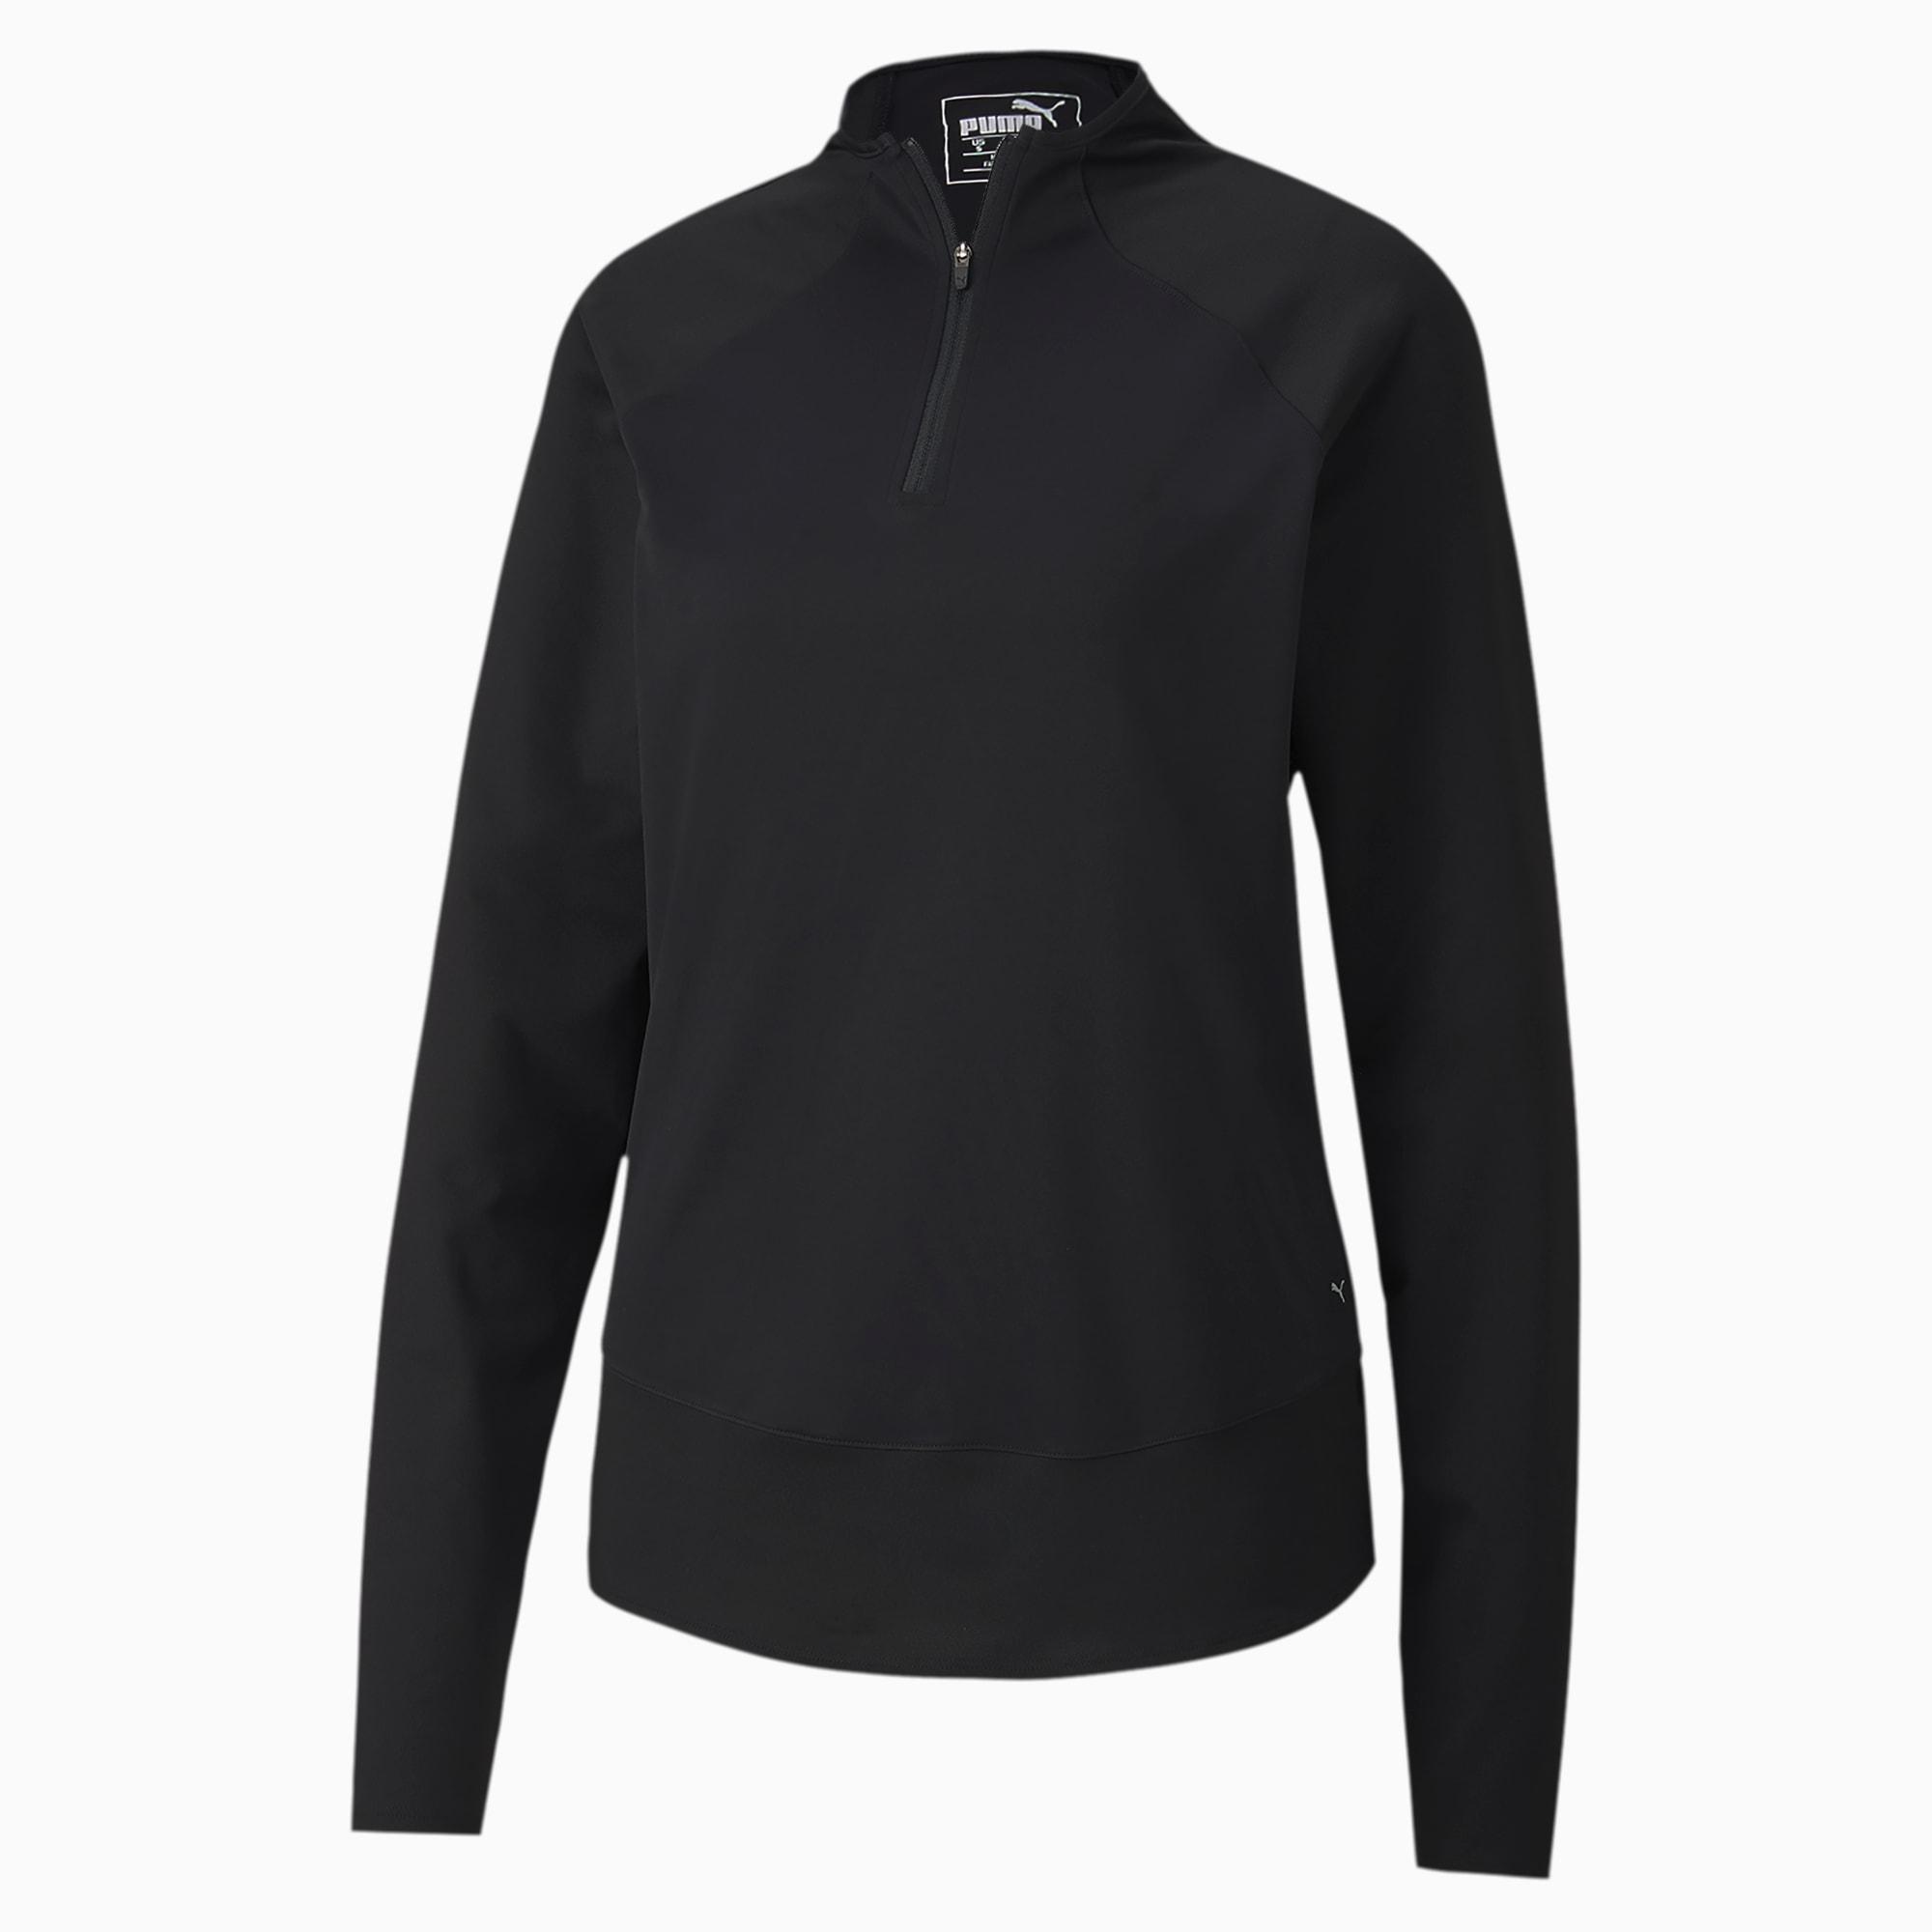 Camiseta de Golf Para Mujer Mesh 1/4 Zip, Negro, Talla XL | PUMA Mujeres